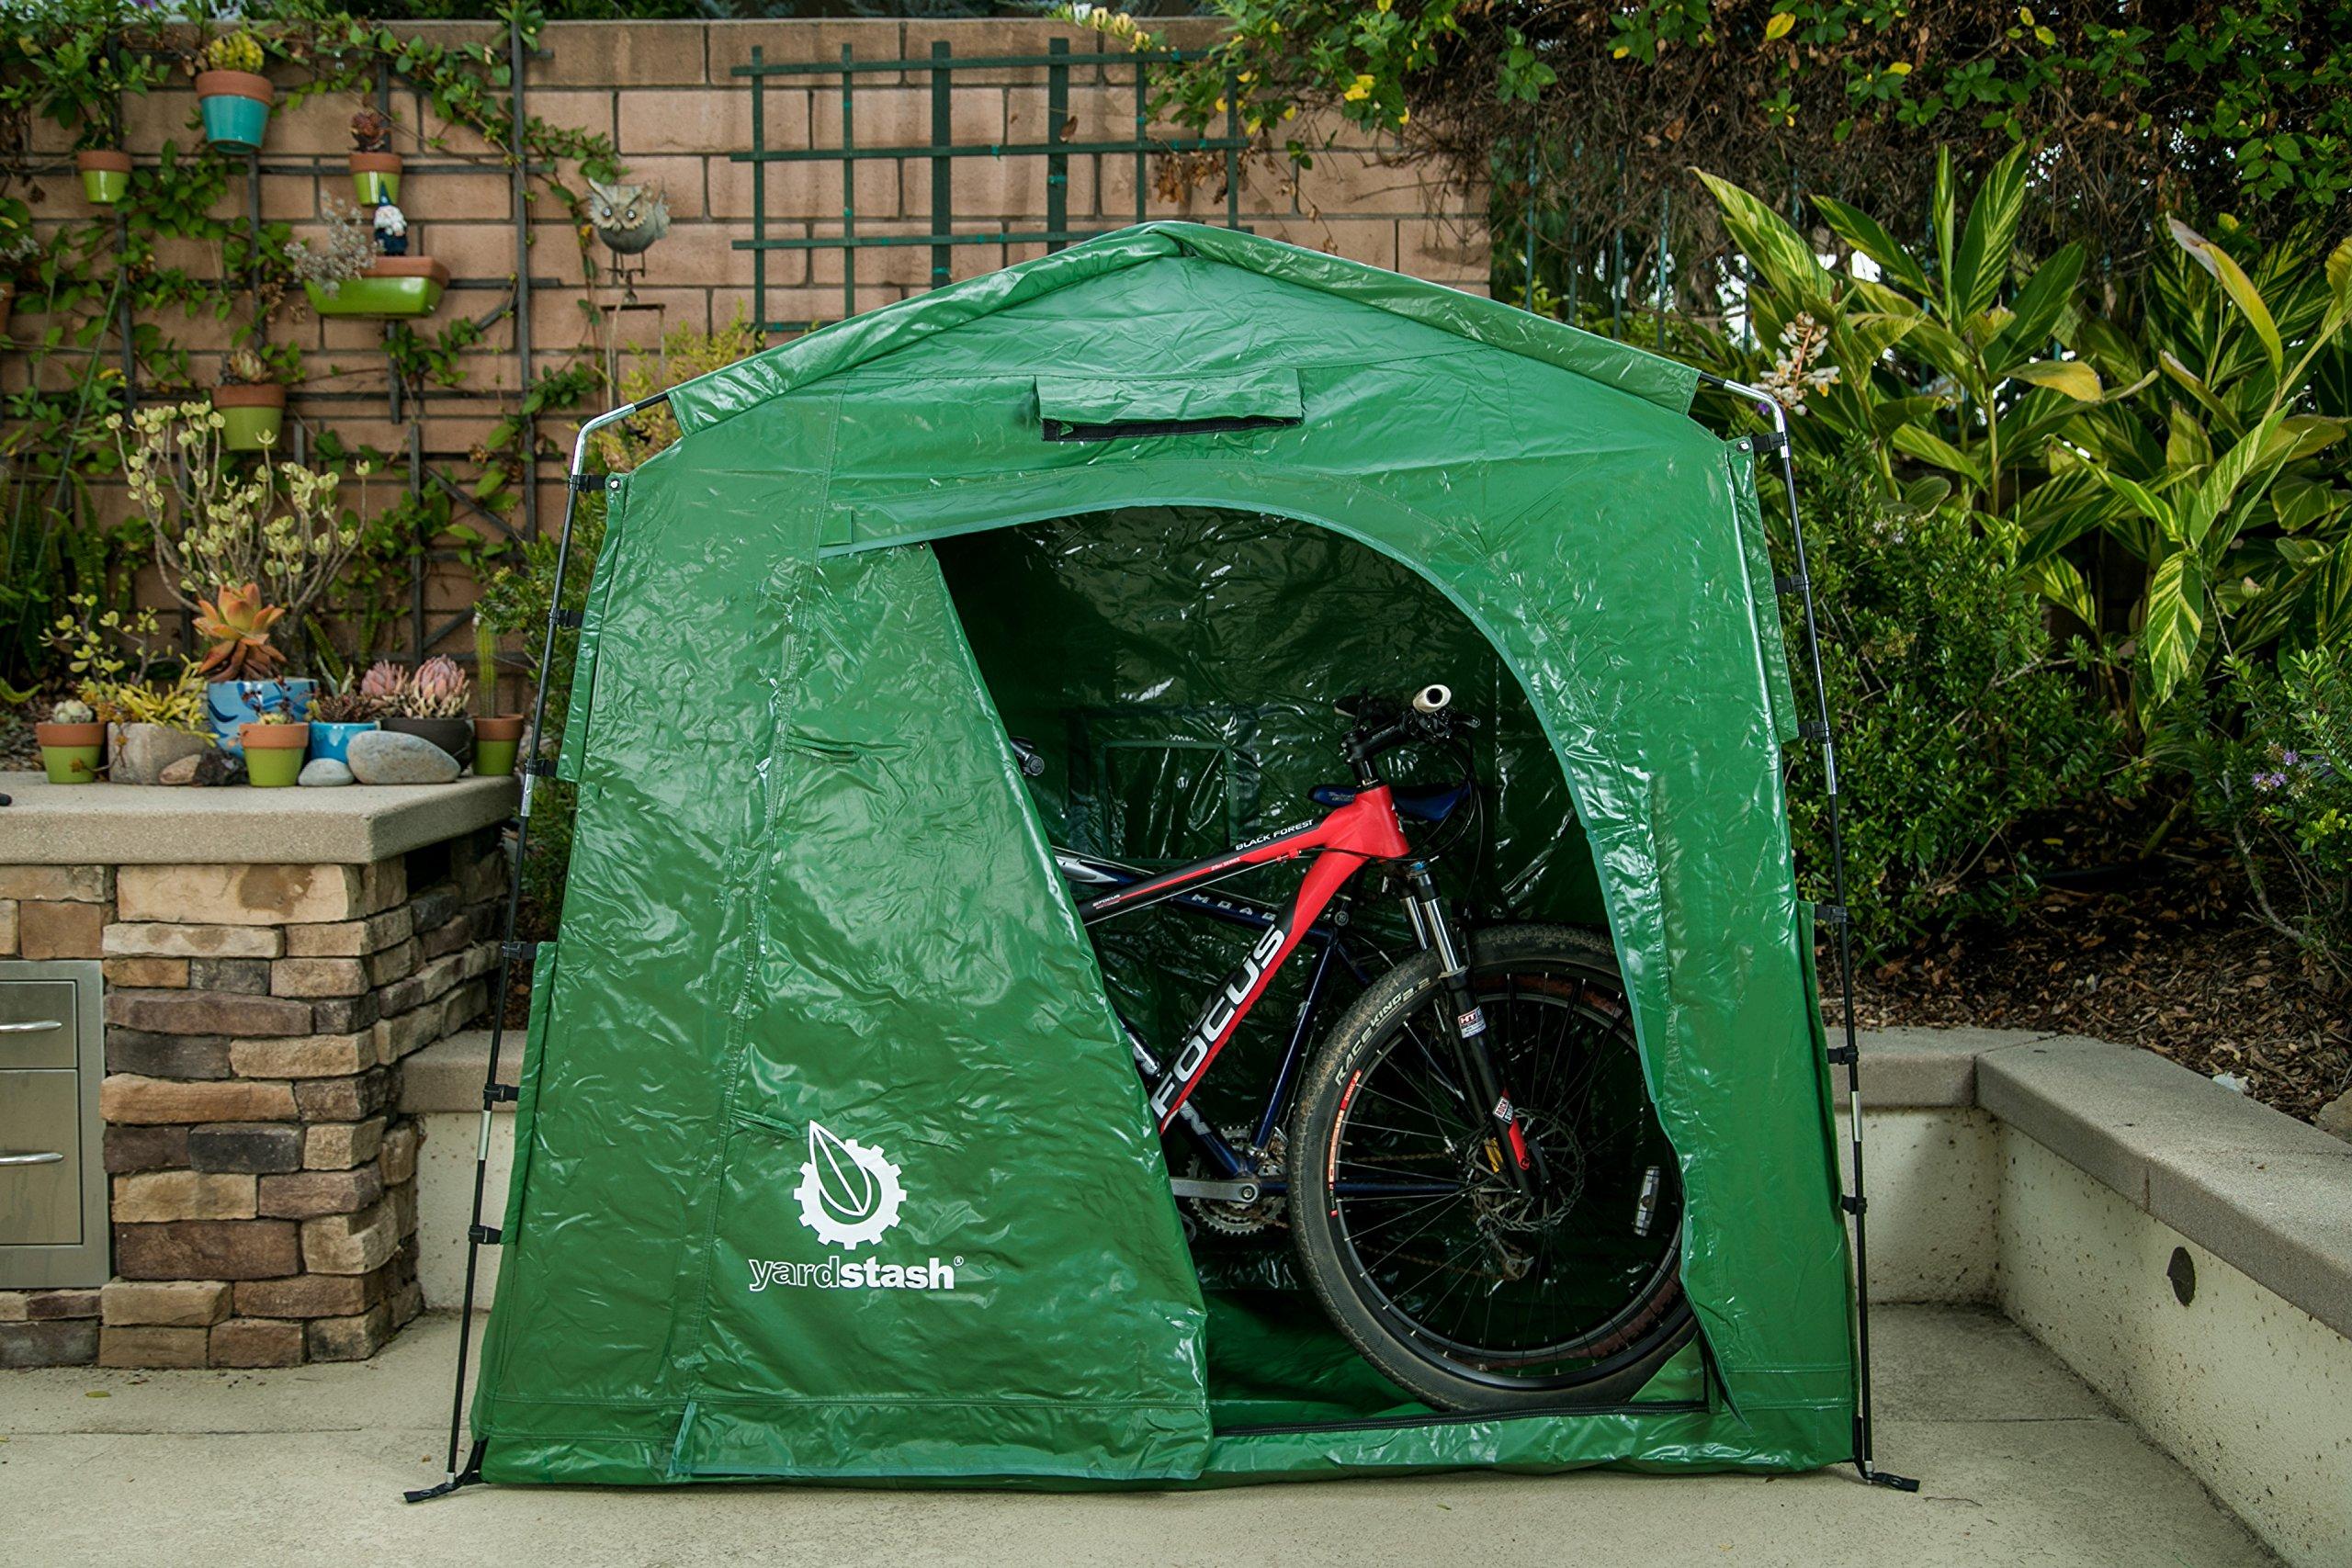 storage shed tent tarpaulin tarp weatherproof heavy duty vinyl outdoor bicycle  ebay